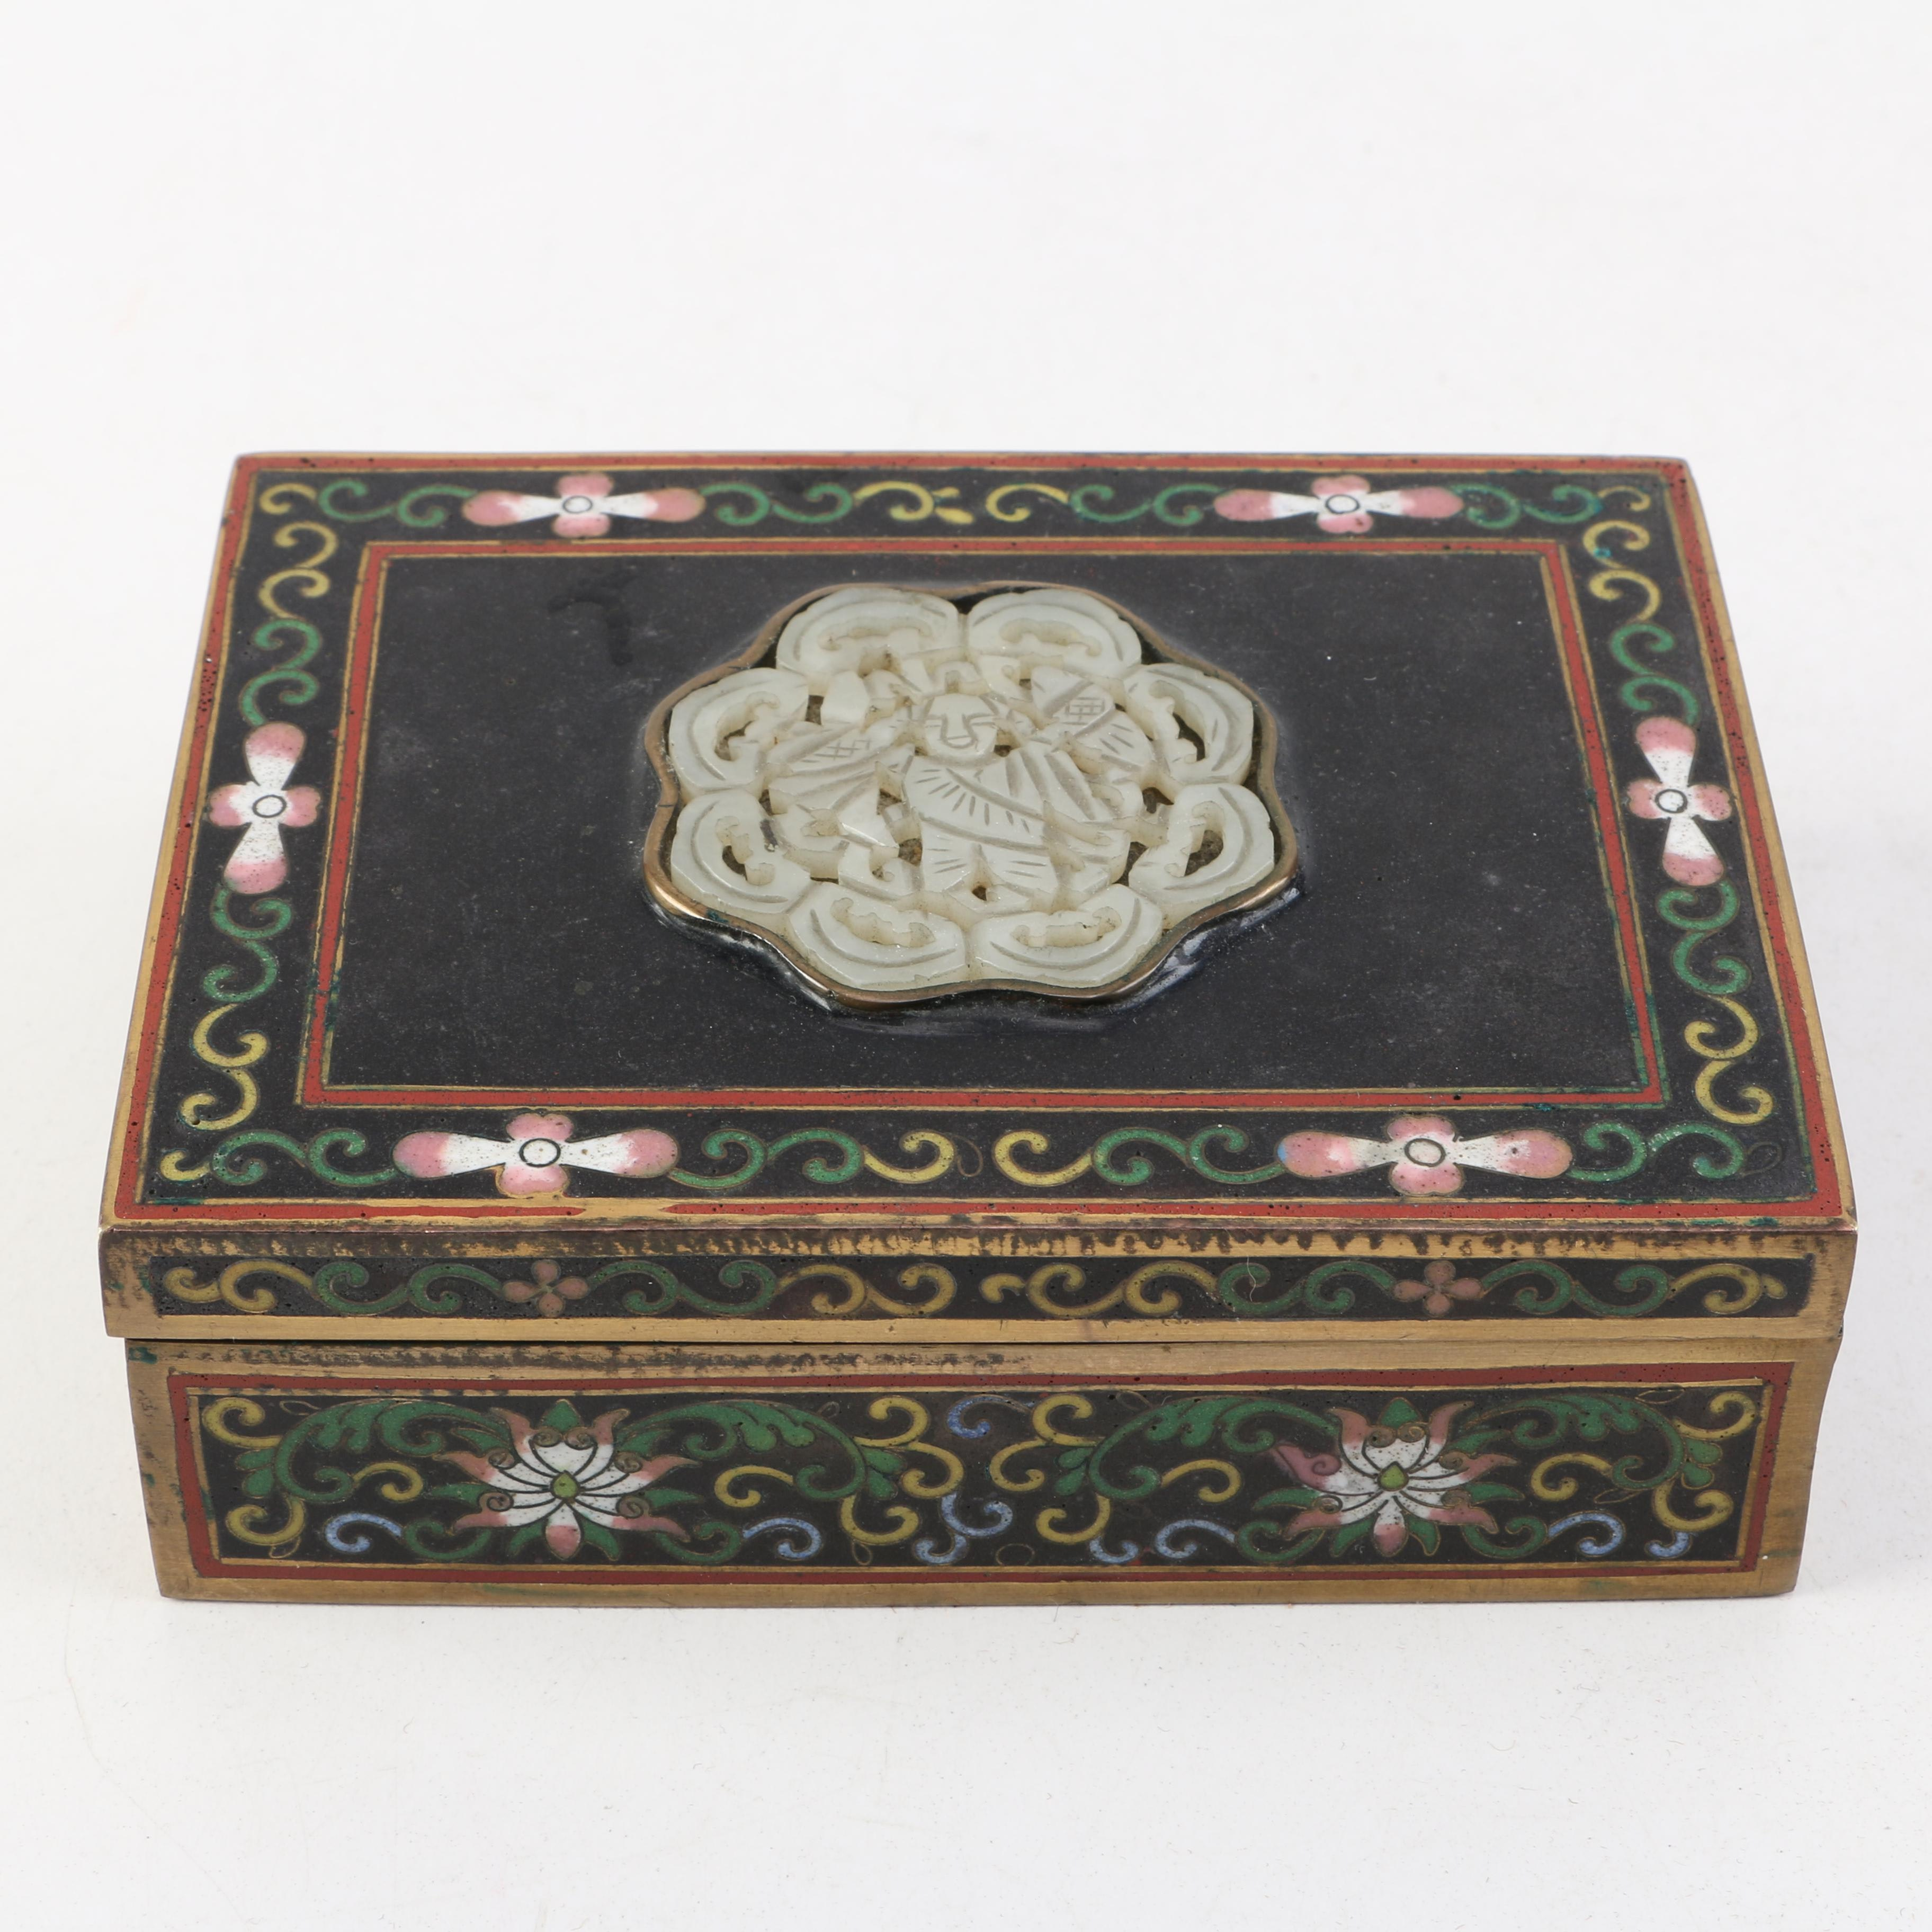 Vintage Chinese Cloisonné Trinket Box With Bowenite Medallion